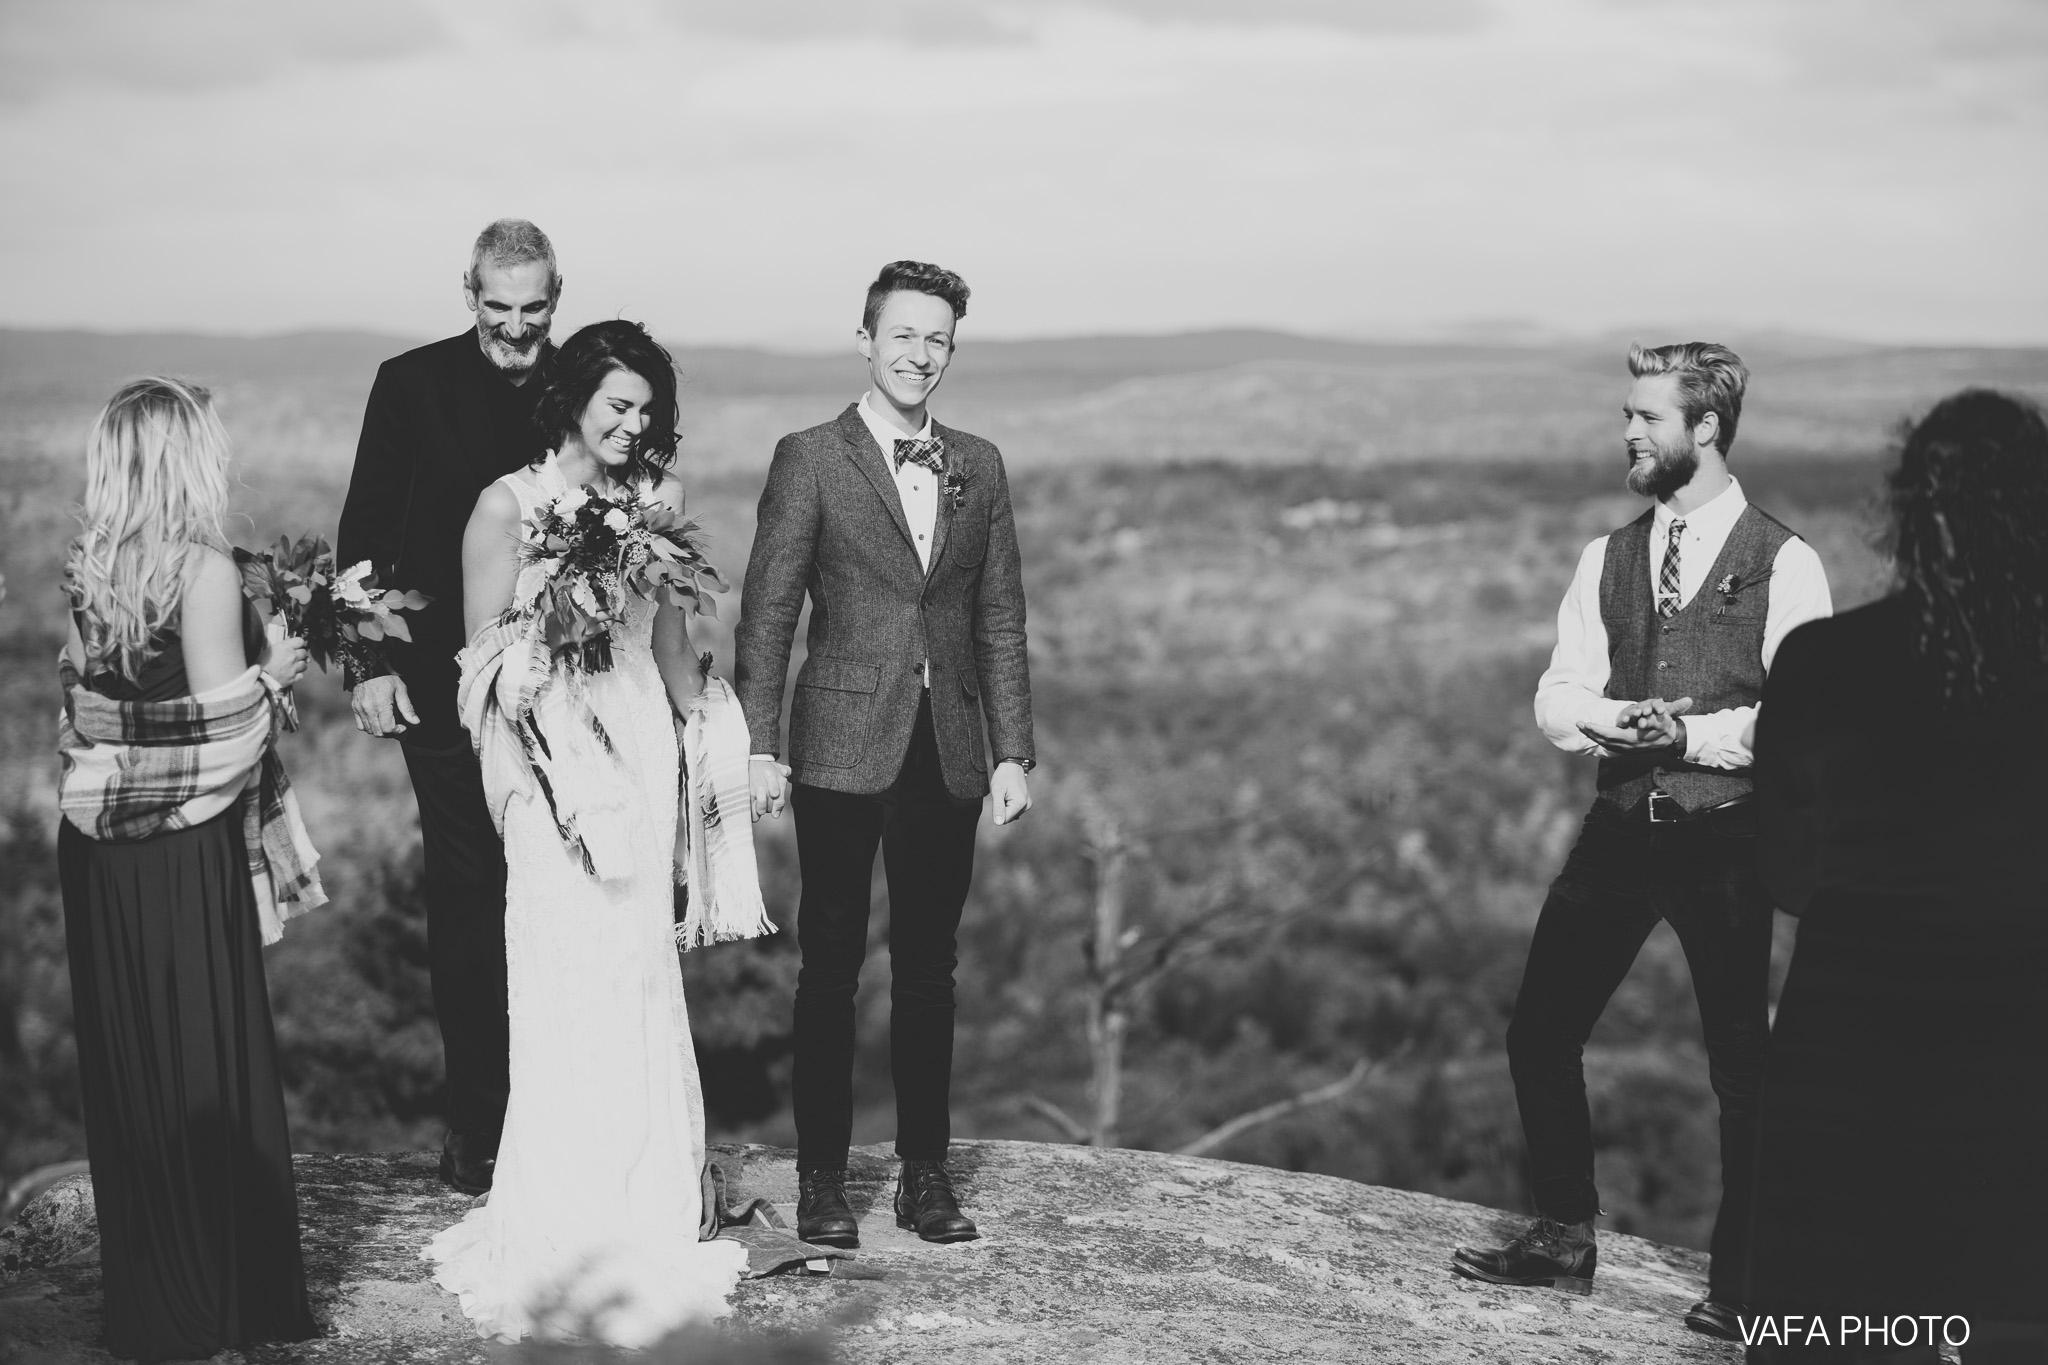 Hogback-Mountain-Wedding-Chelsea-Josh-Vafa-Photo-262.jpg